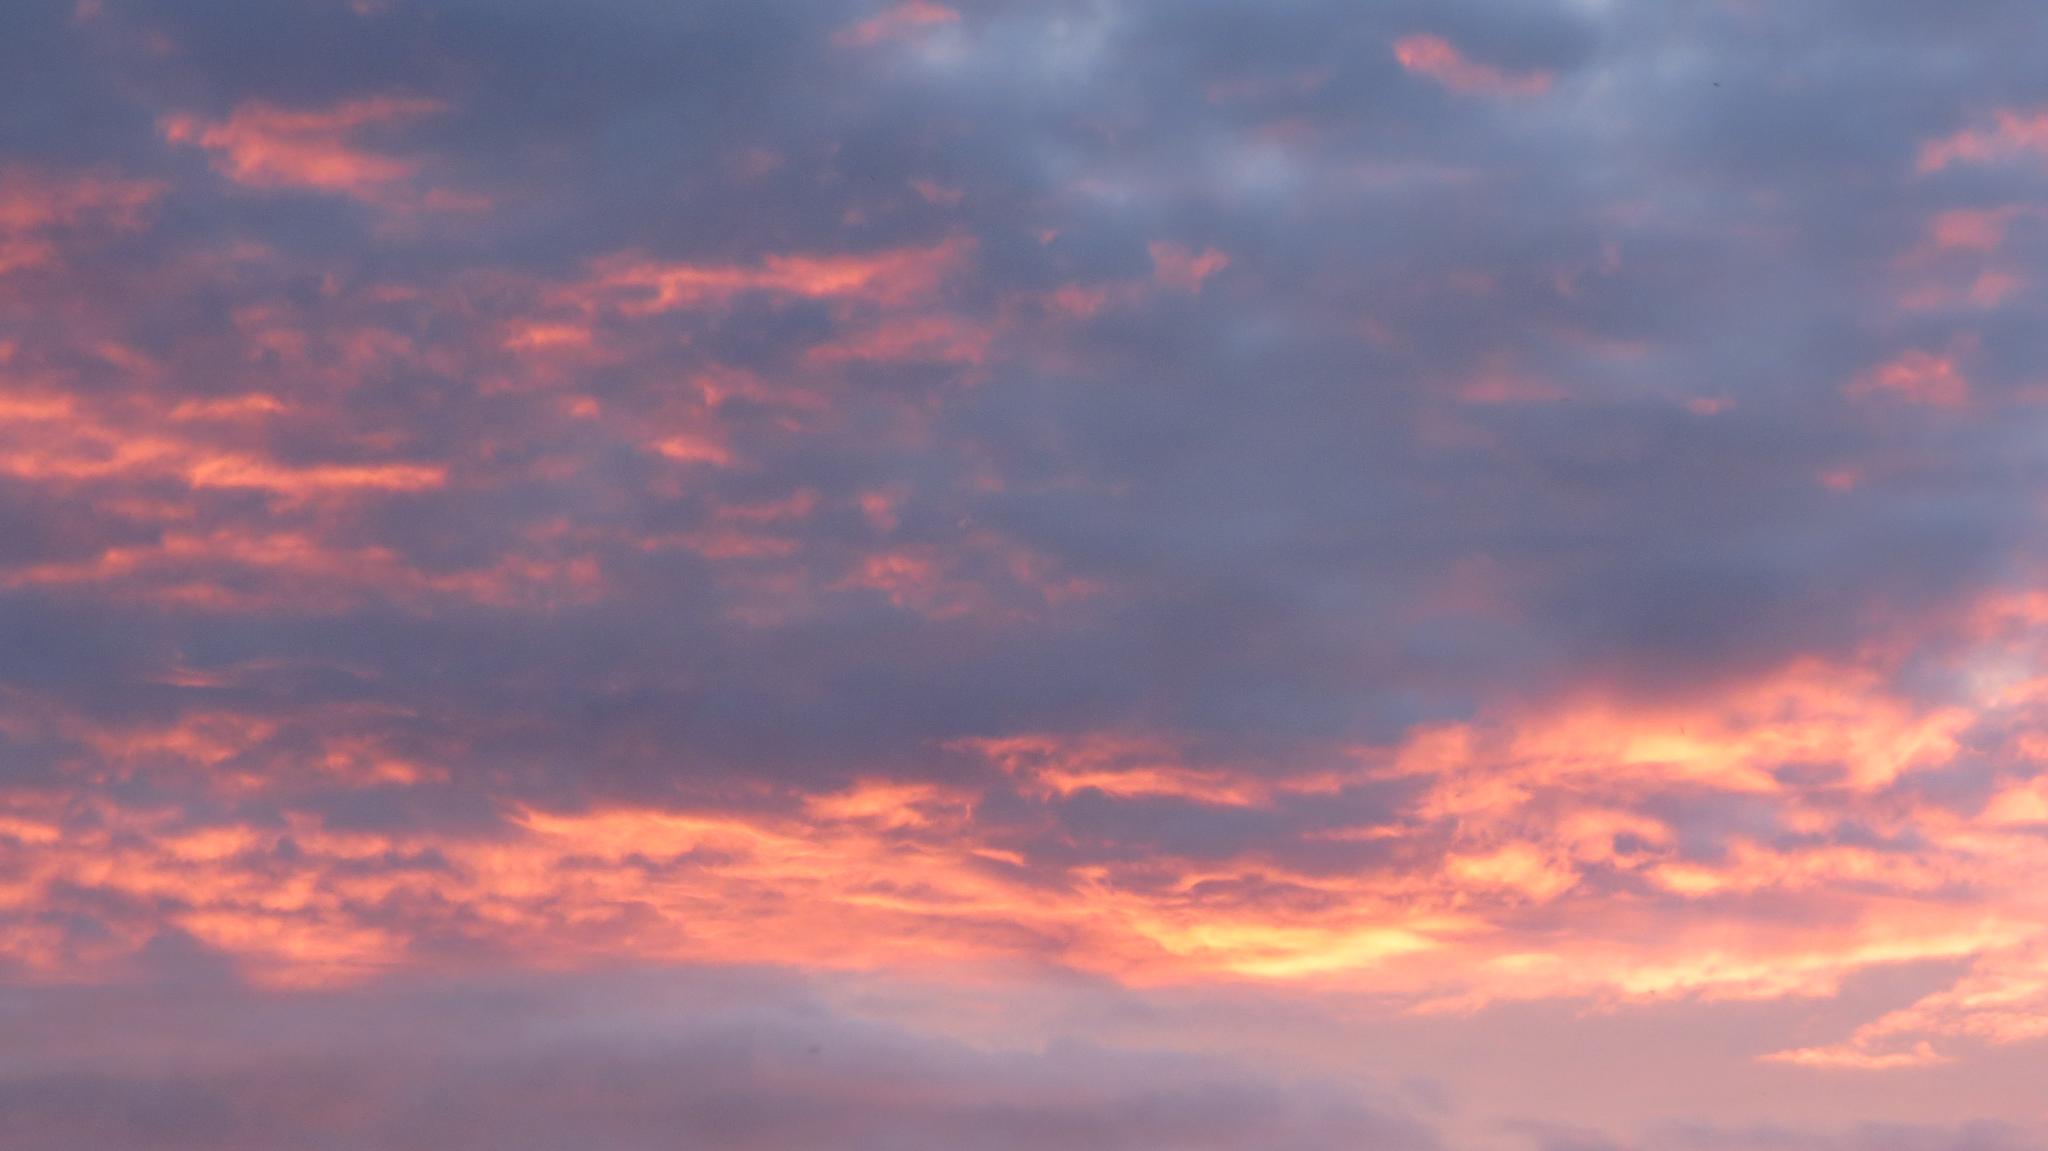 Fire in the sky by Davie Butler